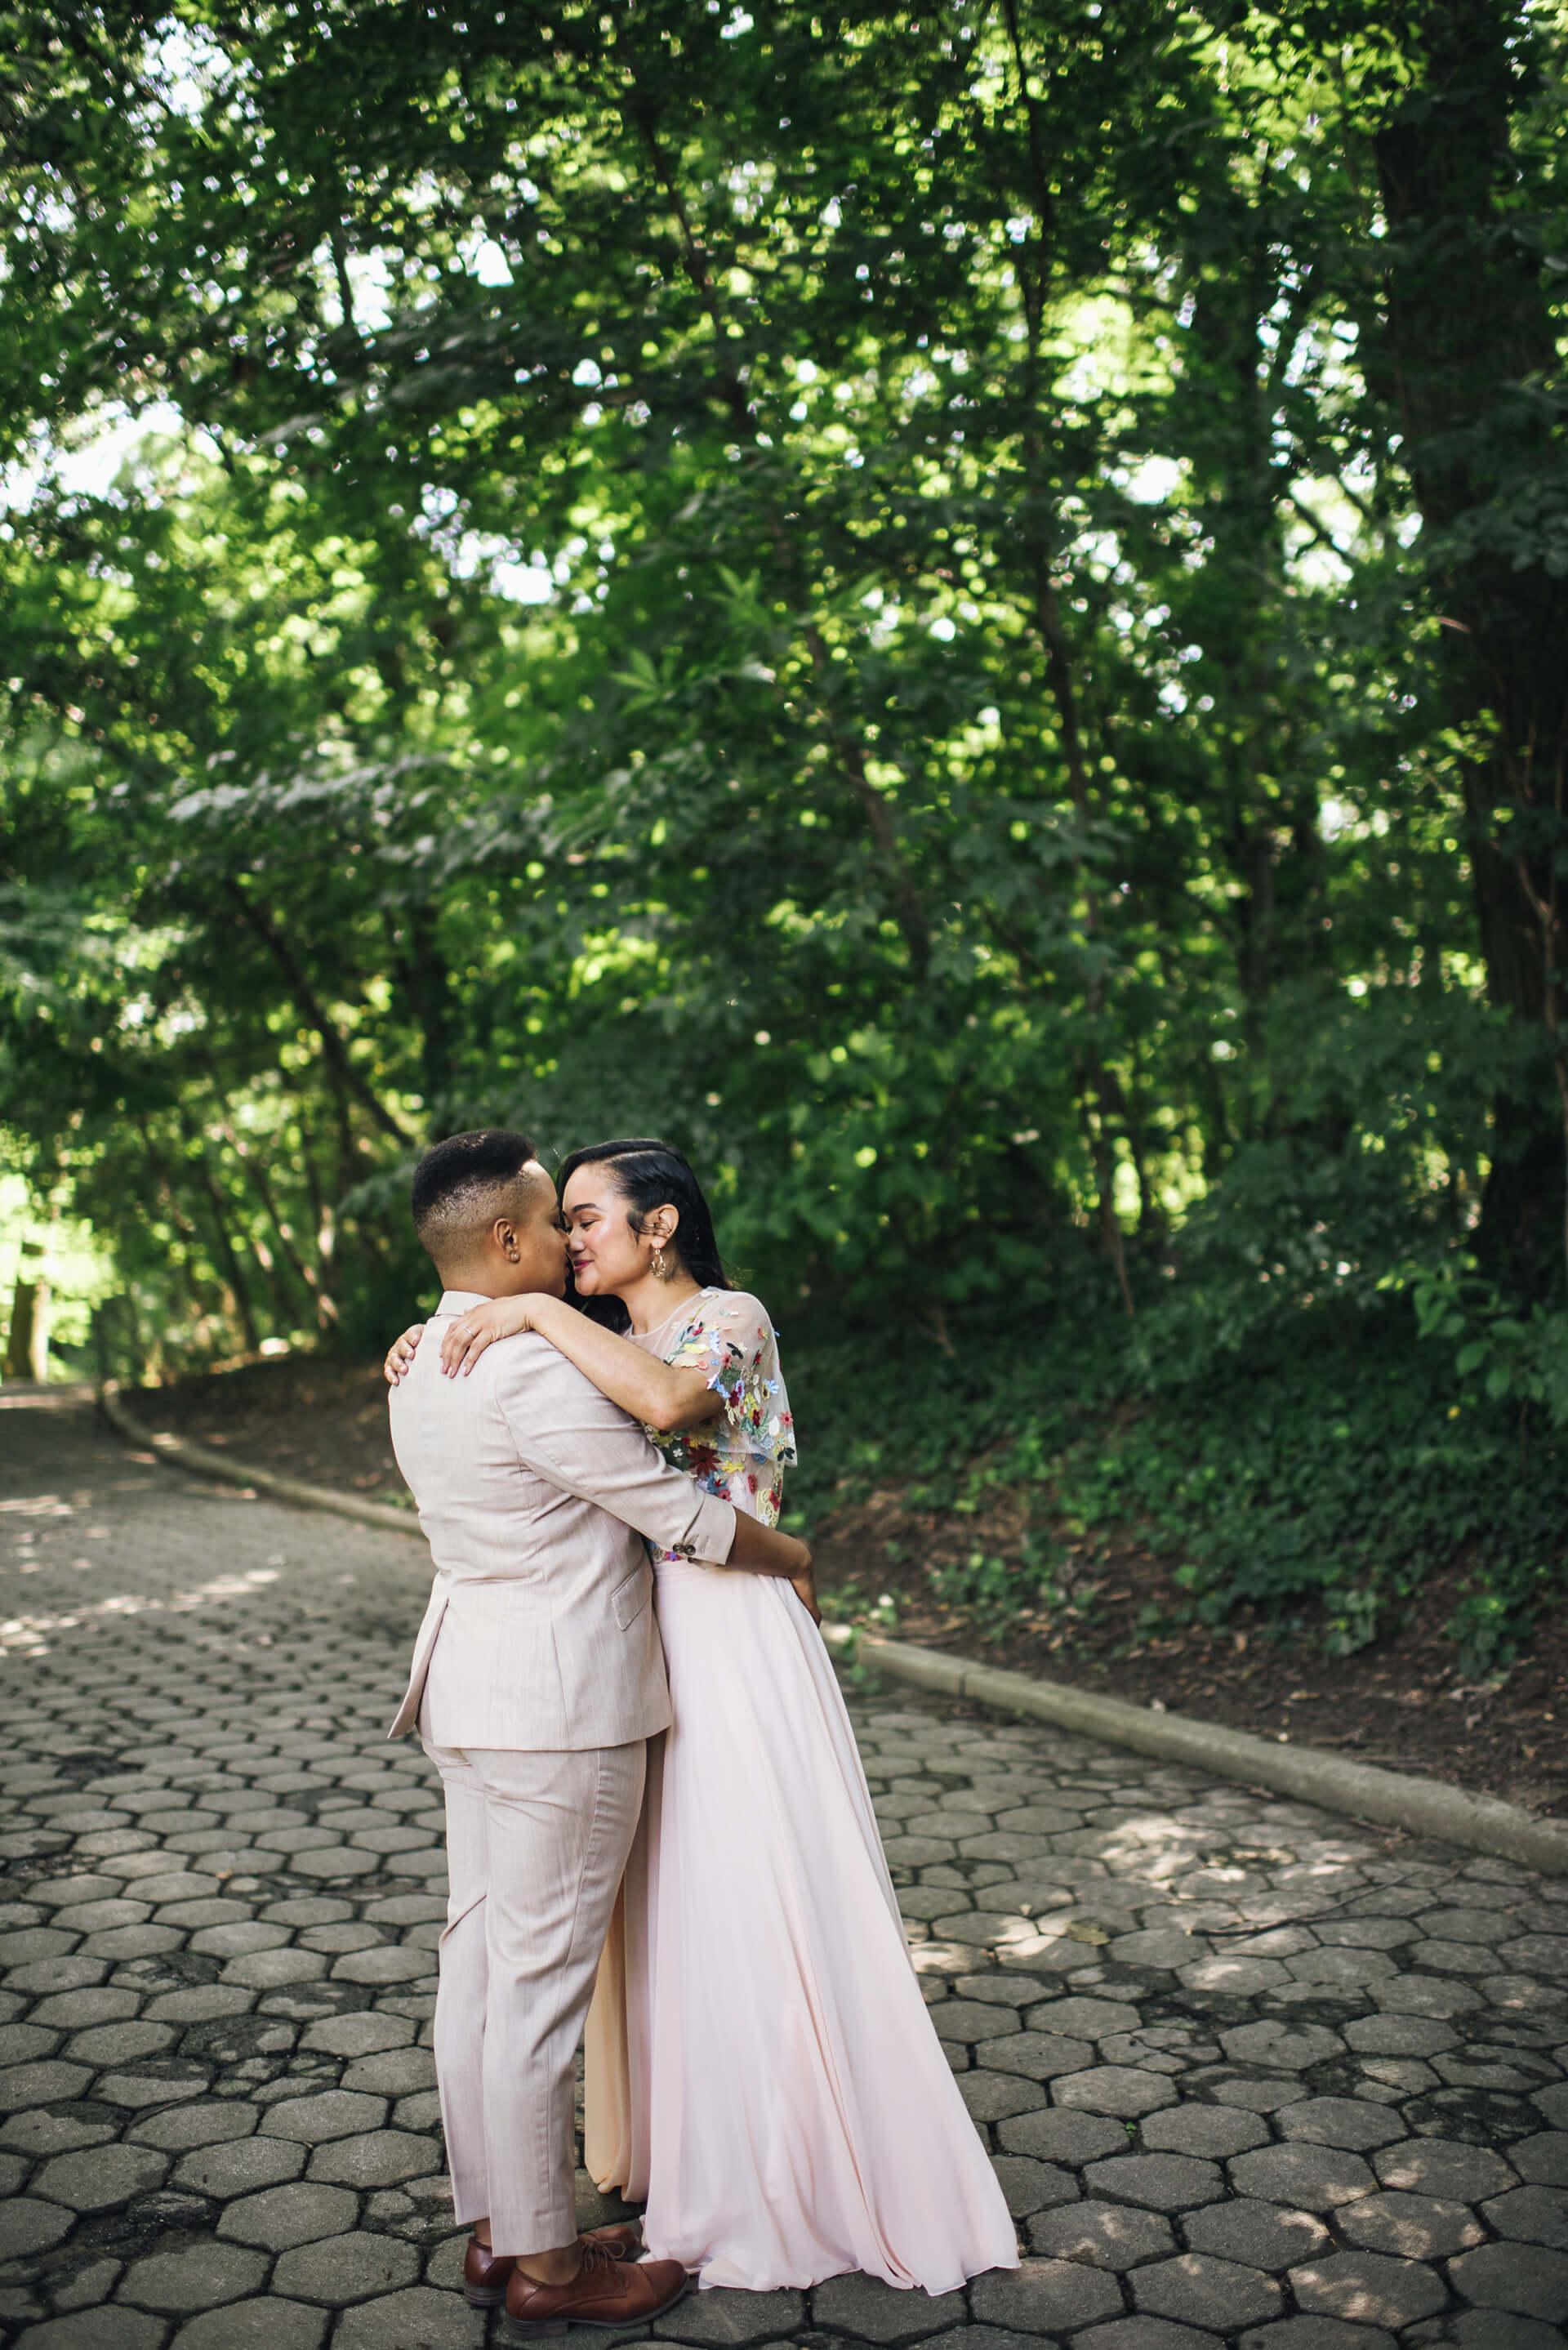 BROOKLYN SOCIETY FOR ETHICAL CULTURE - INTIMATE WEDDING - CHI-CHI ARI-91 (1).jpg